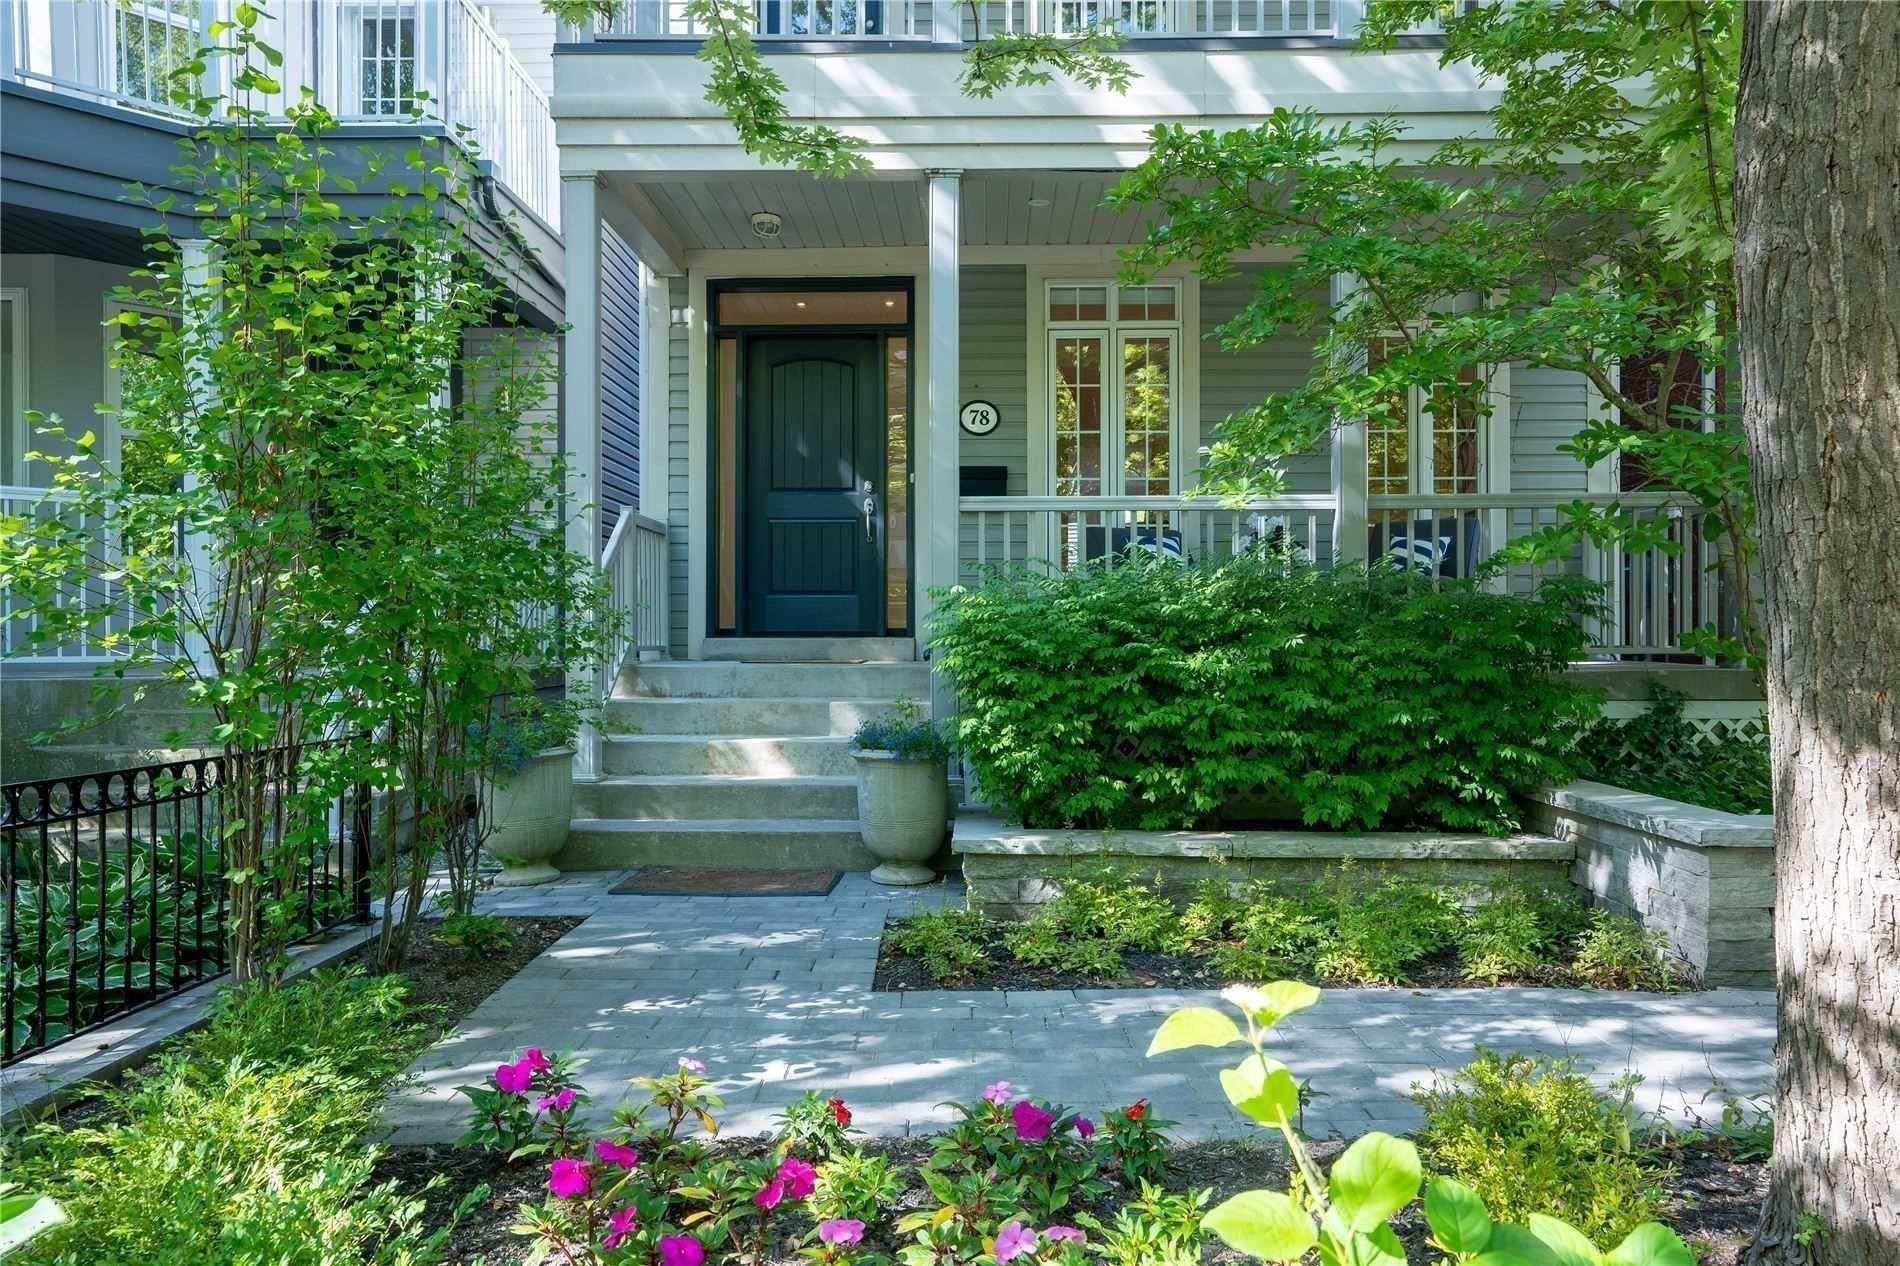 Main Photo: 78 Joseph Duggan Road in Toronto: The Beaches House (3-Storey) for sale (Toronto E02)  : MLS®# E4956298